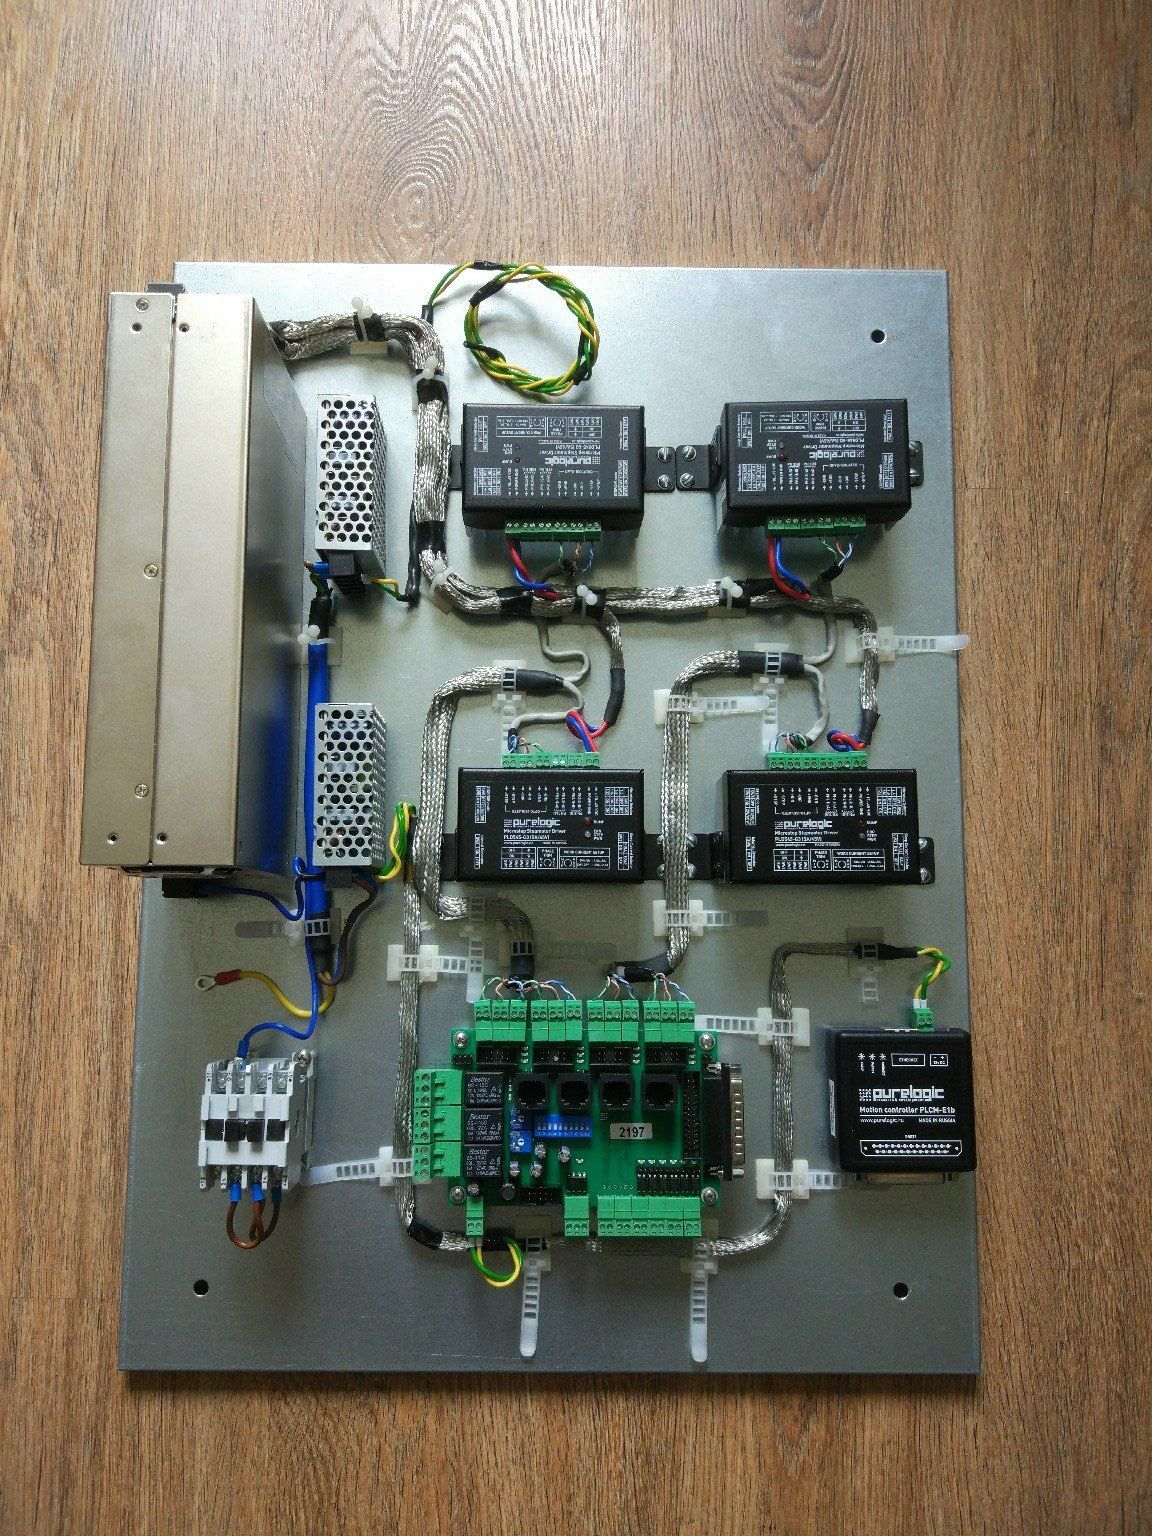 Elementy Bloka Upravleniya Stankom Plazmennoj Rezki Cnc Plasma Table Control Box Guts Cnc Controller Diy Cnc Cnc Projects